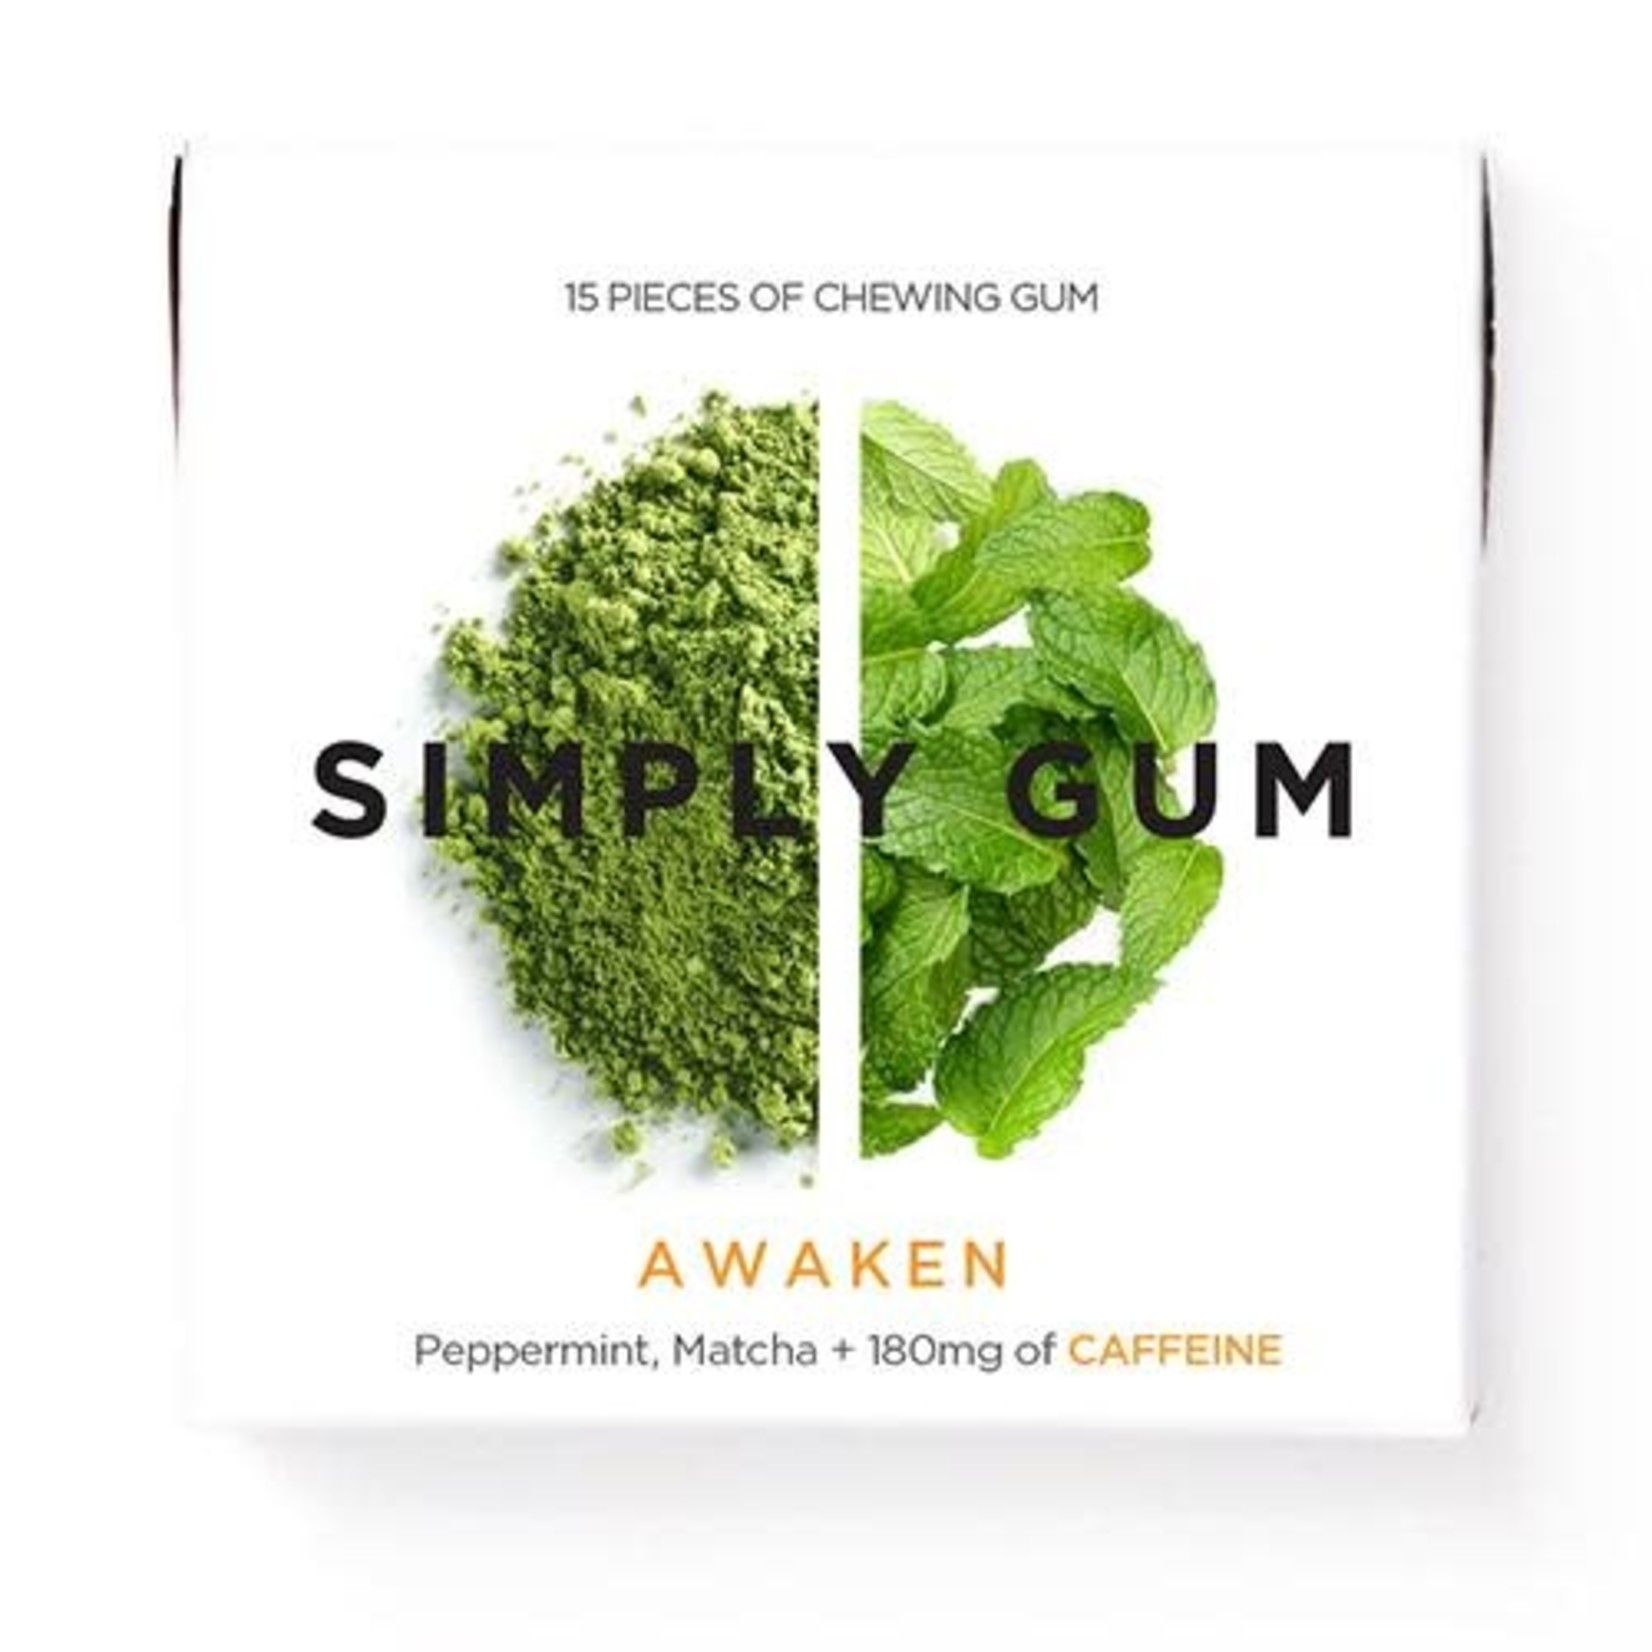 SIMPLY GUM AWAKEN GUM (CAFFEINE)